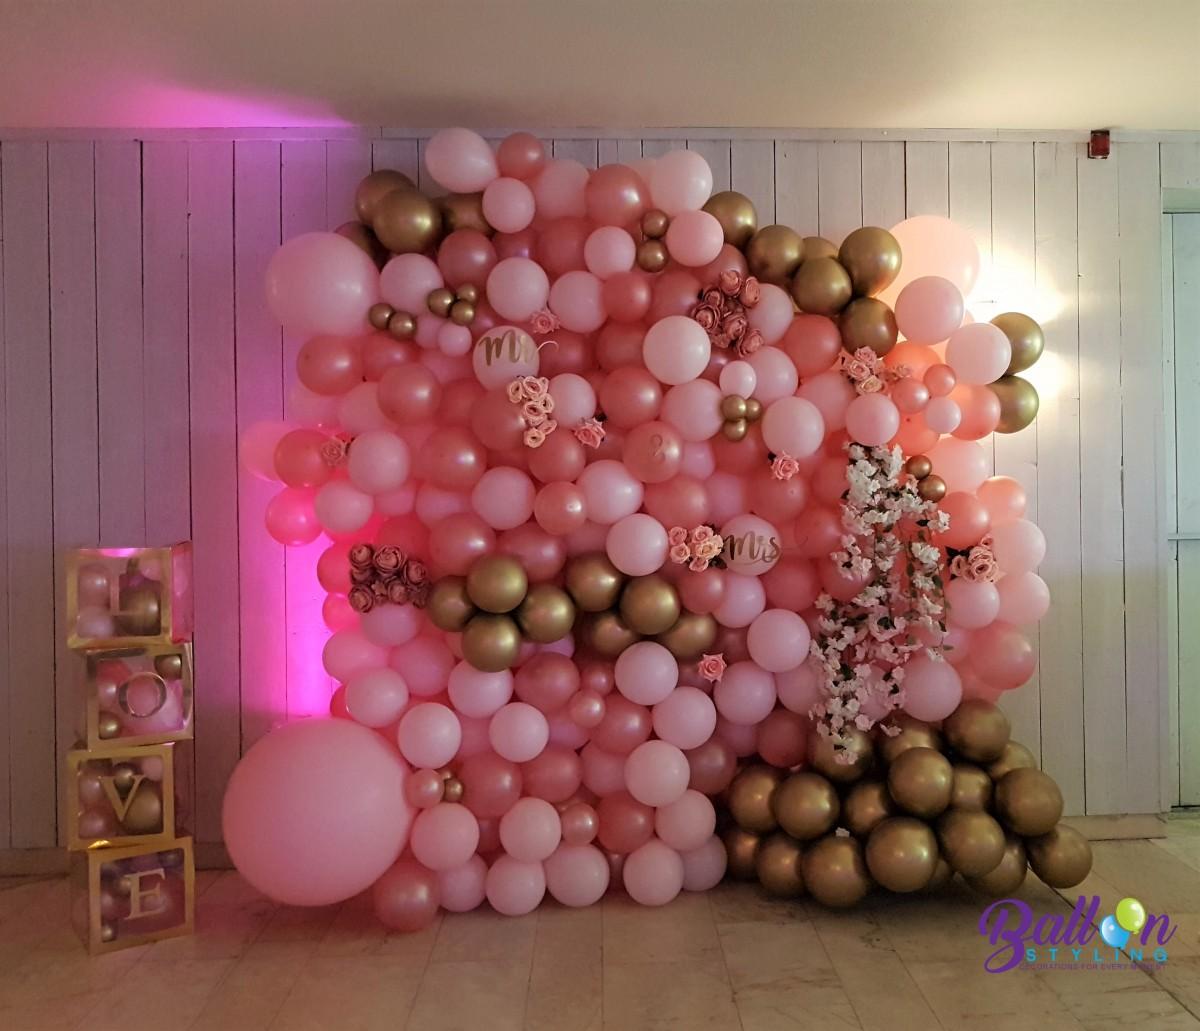 Balloon Styling Tilburg ballonnenmuur ballonmuur ballonnenwand ballonwand LOVE DOVES dozen Mr en Mrs ballonnen Tilburg (1)